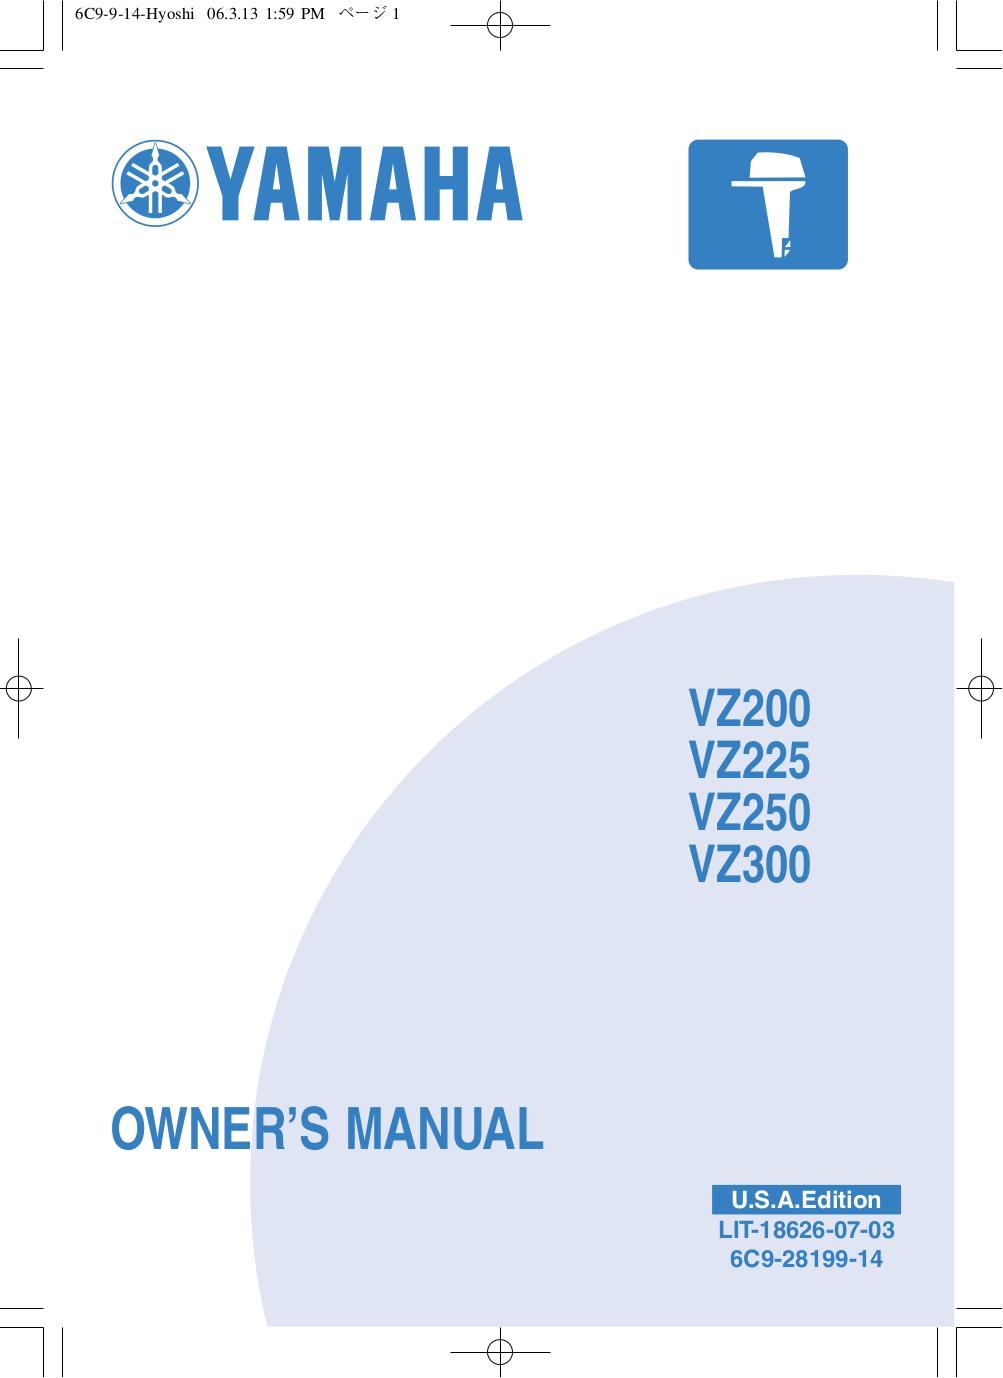 Download free pdf for yamaha tx 300 receiver manual for Yamaha rx v473 manual